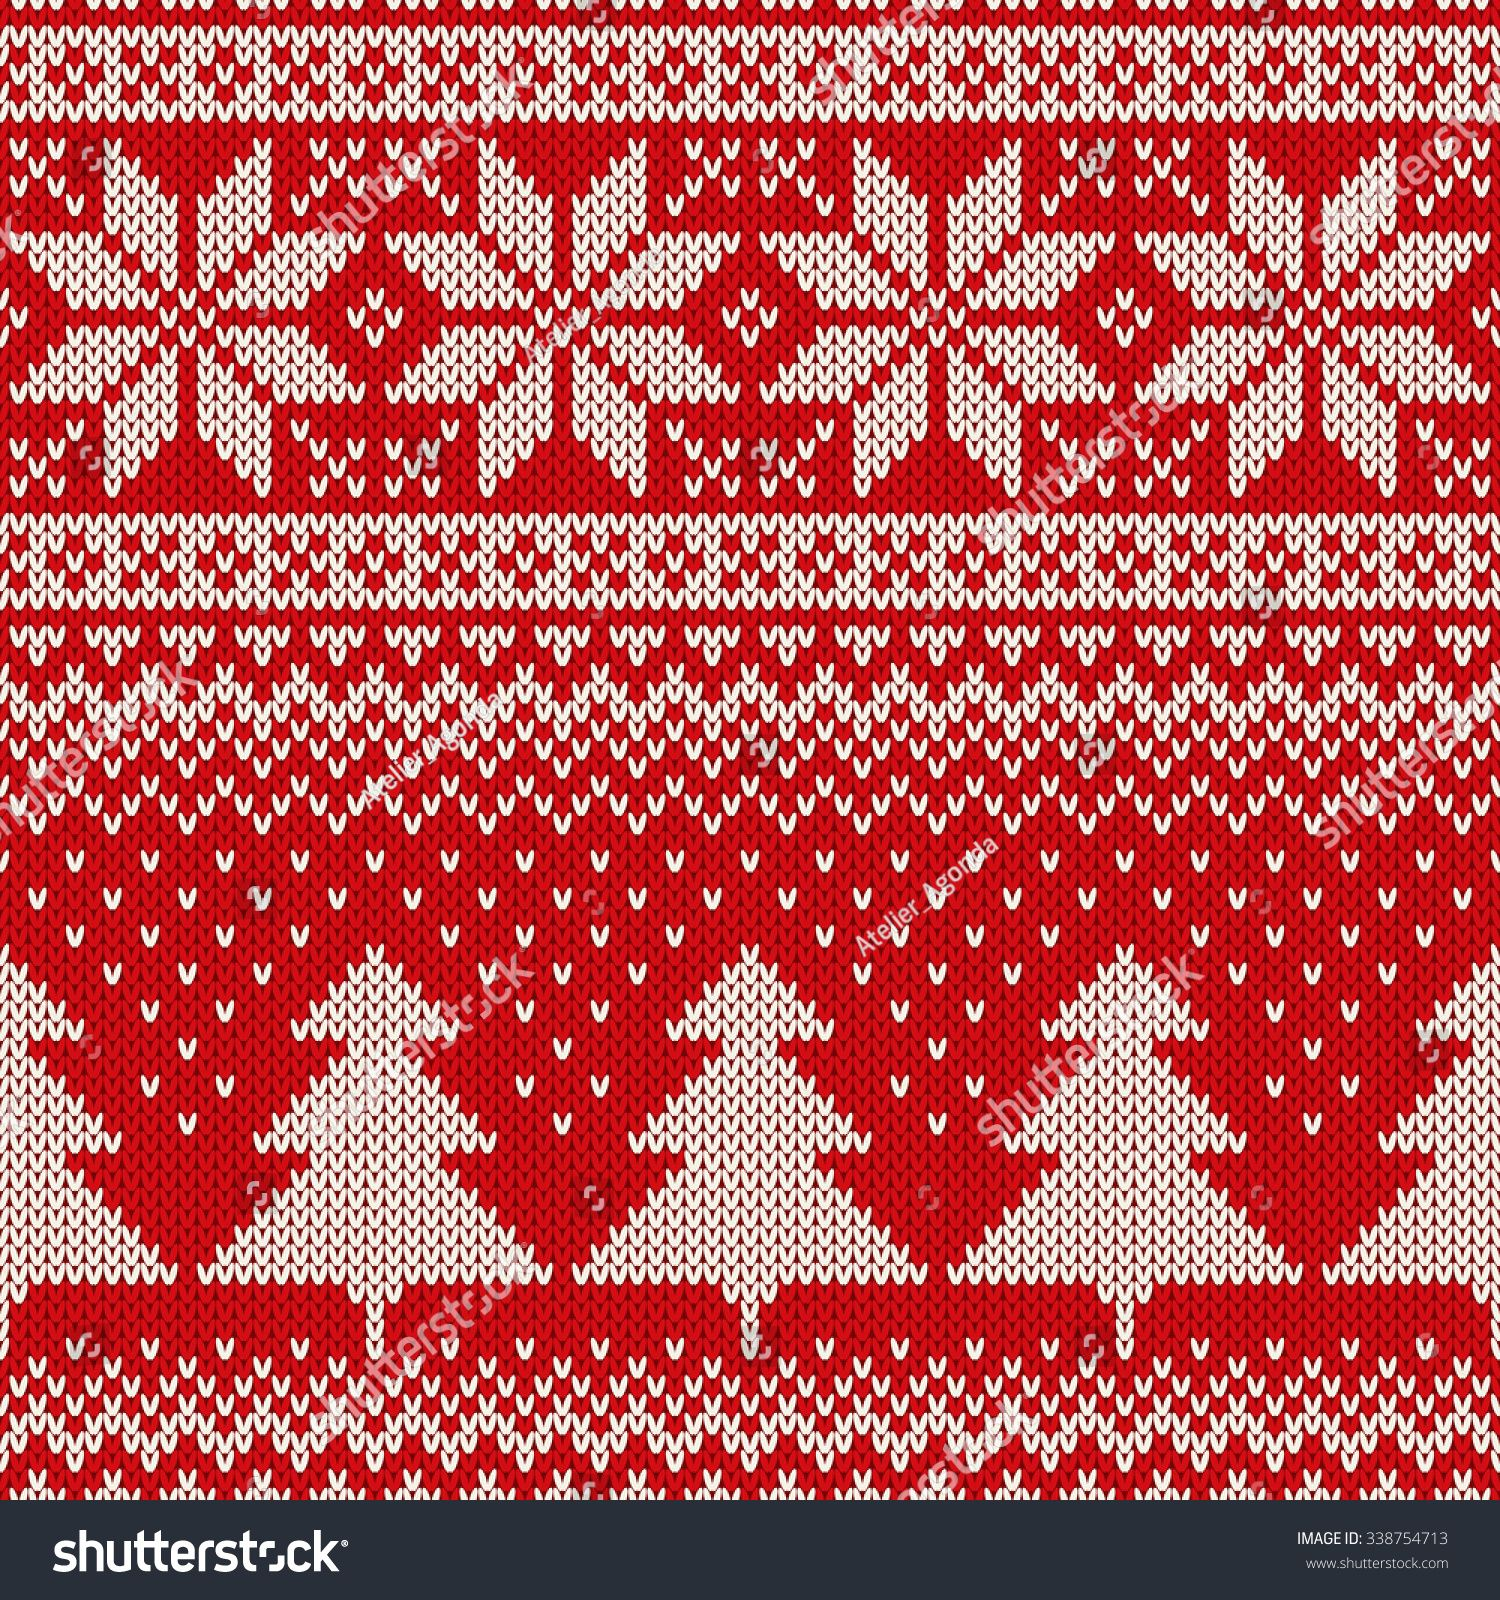 c058600f4478 30 Beautiful Picture of Knitting Pattern Christmas